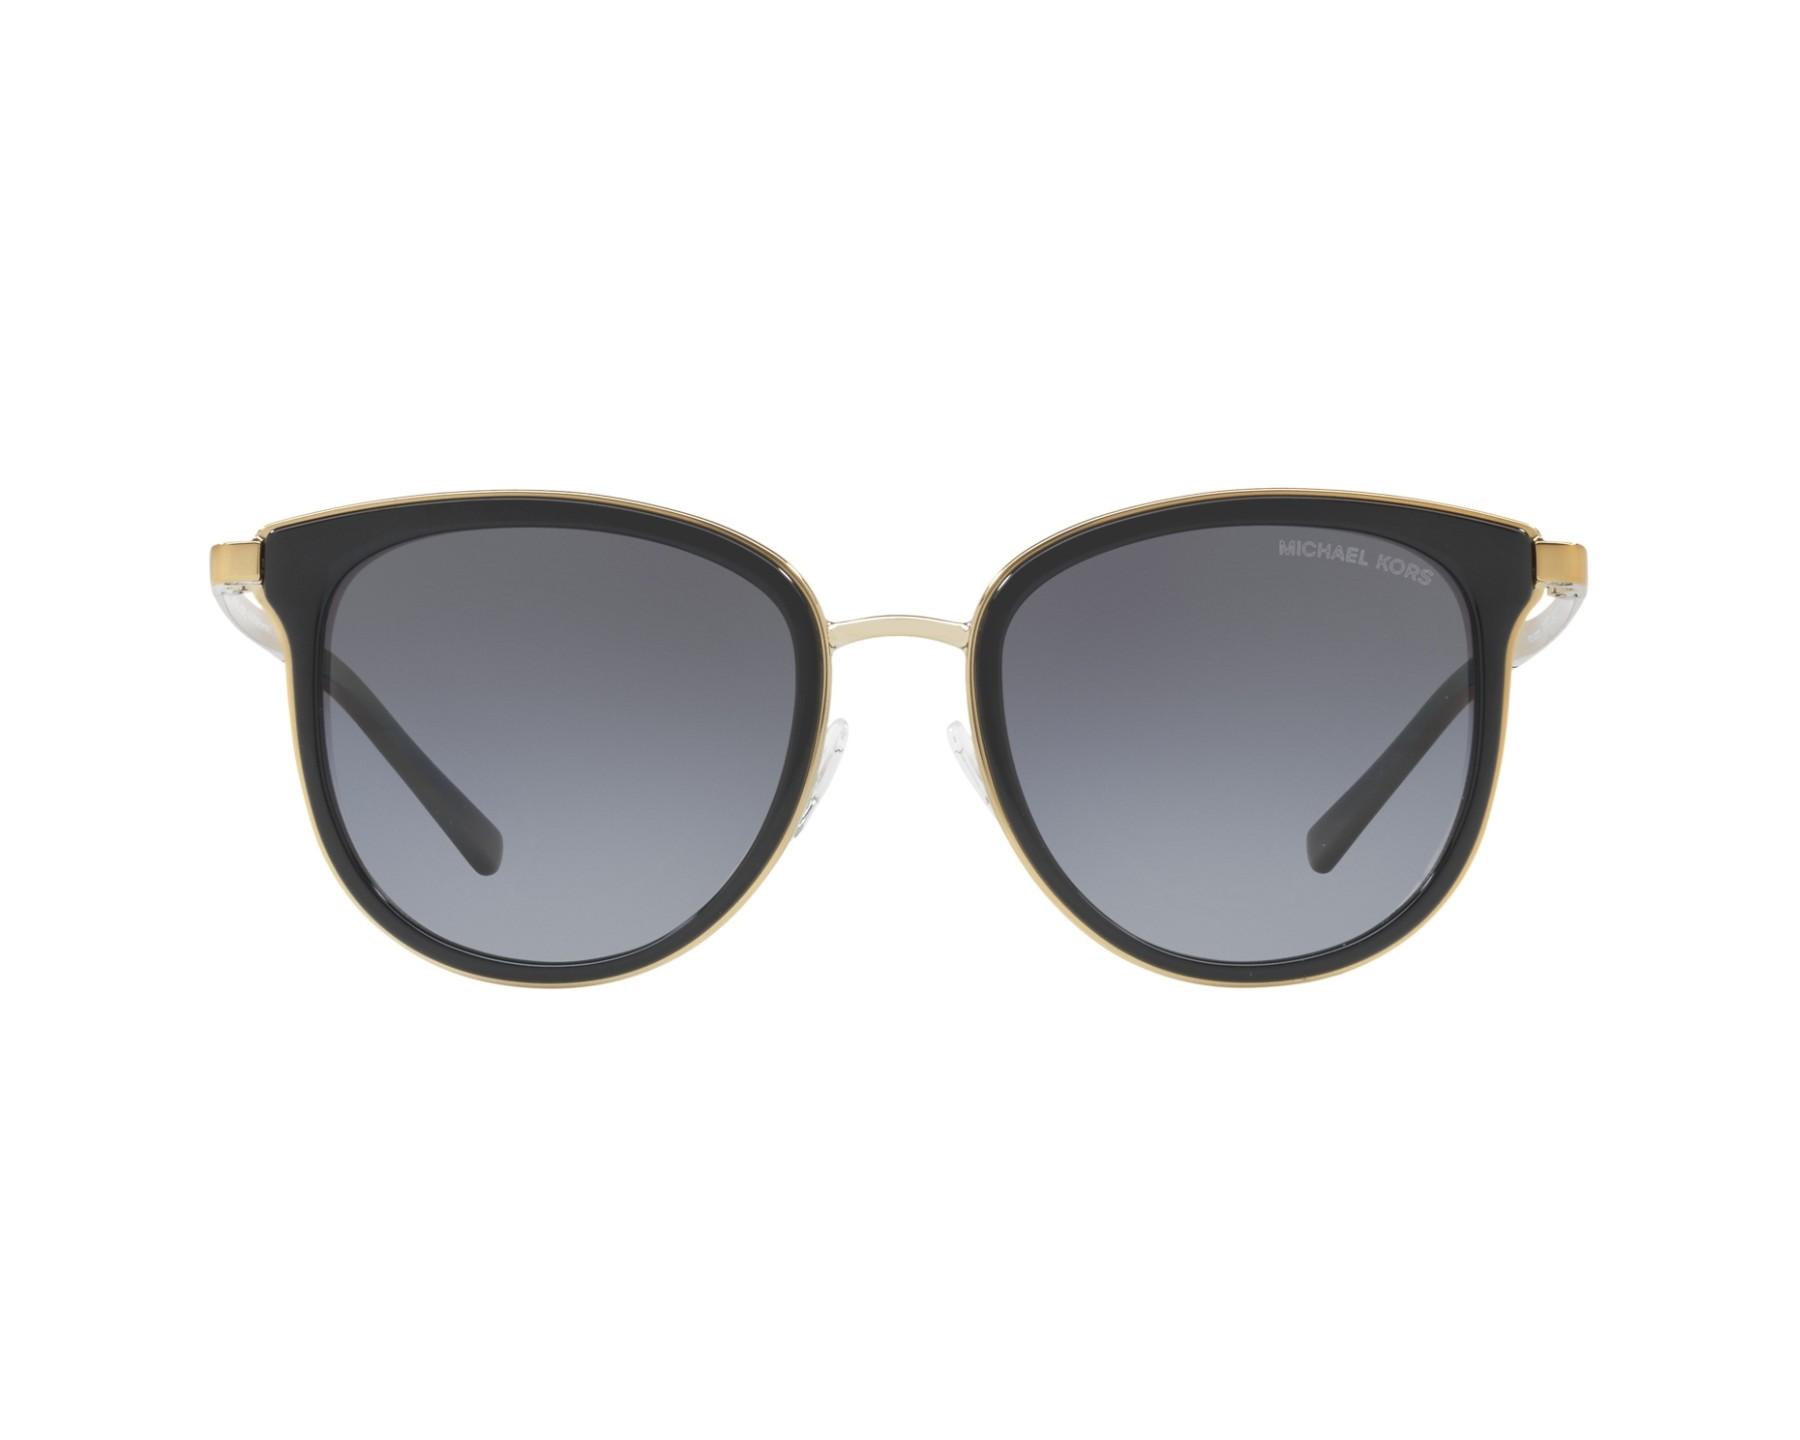 9b1bb7dc40c4 Sunglasses Michael Kors MK-1010 1100T3 54-20 Black Gold 360 degree view 1